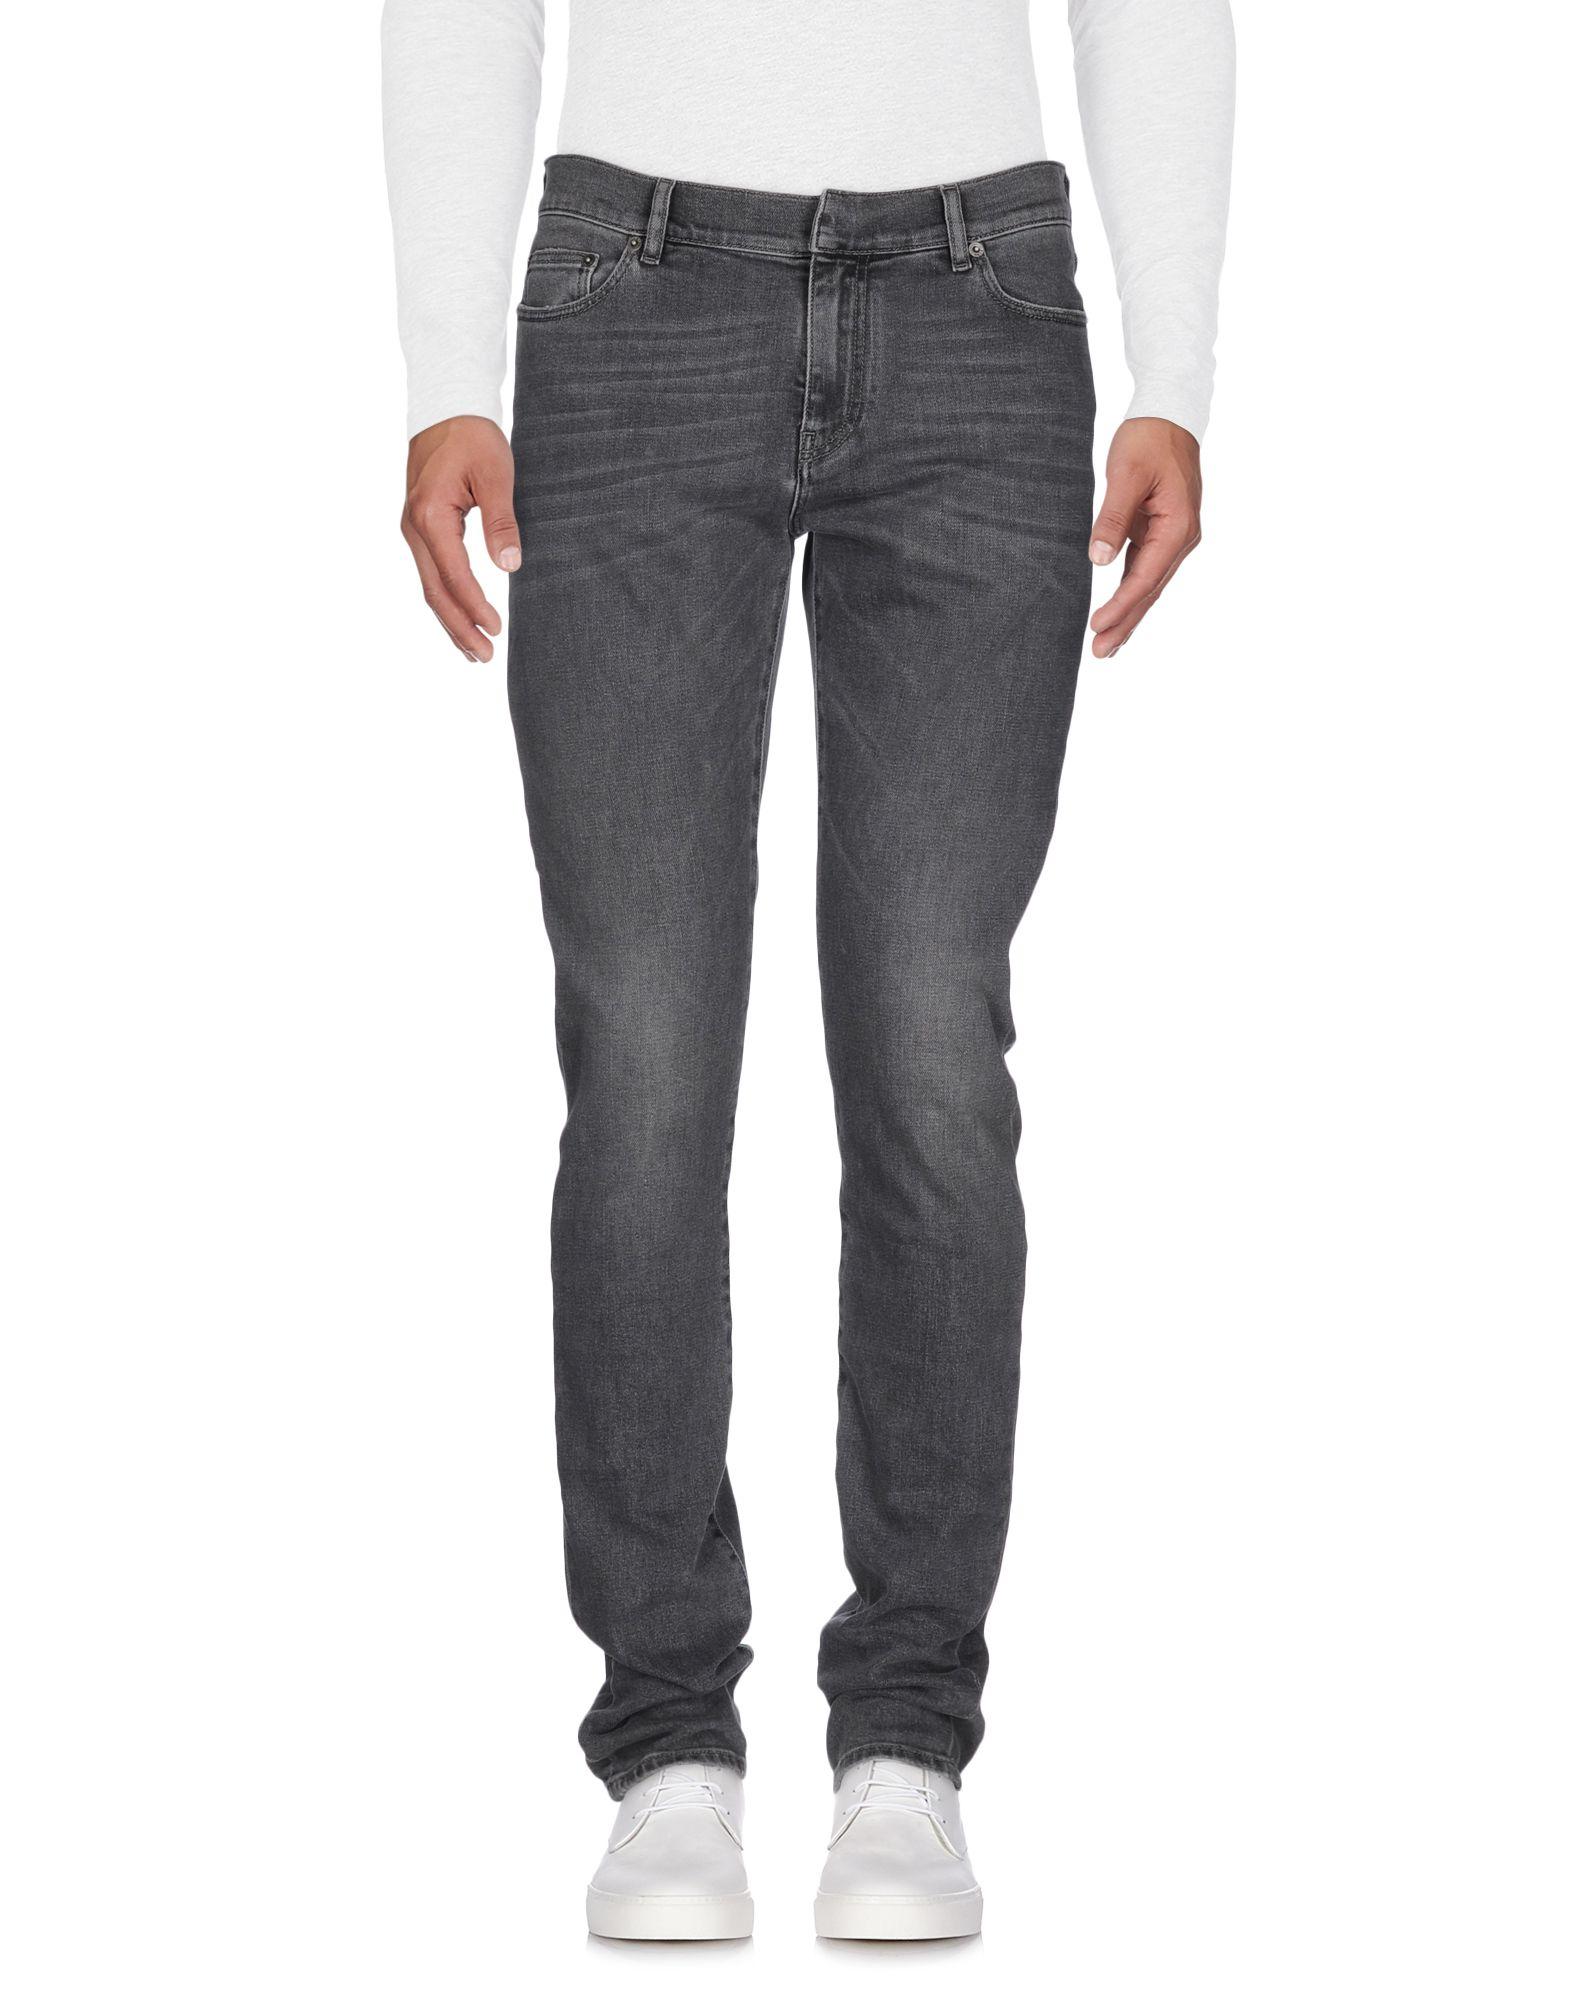 RING Denim Pants in Grey